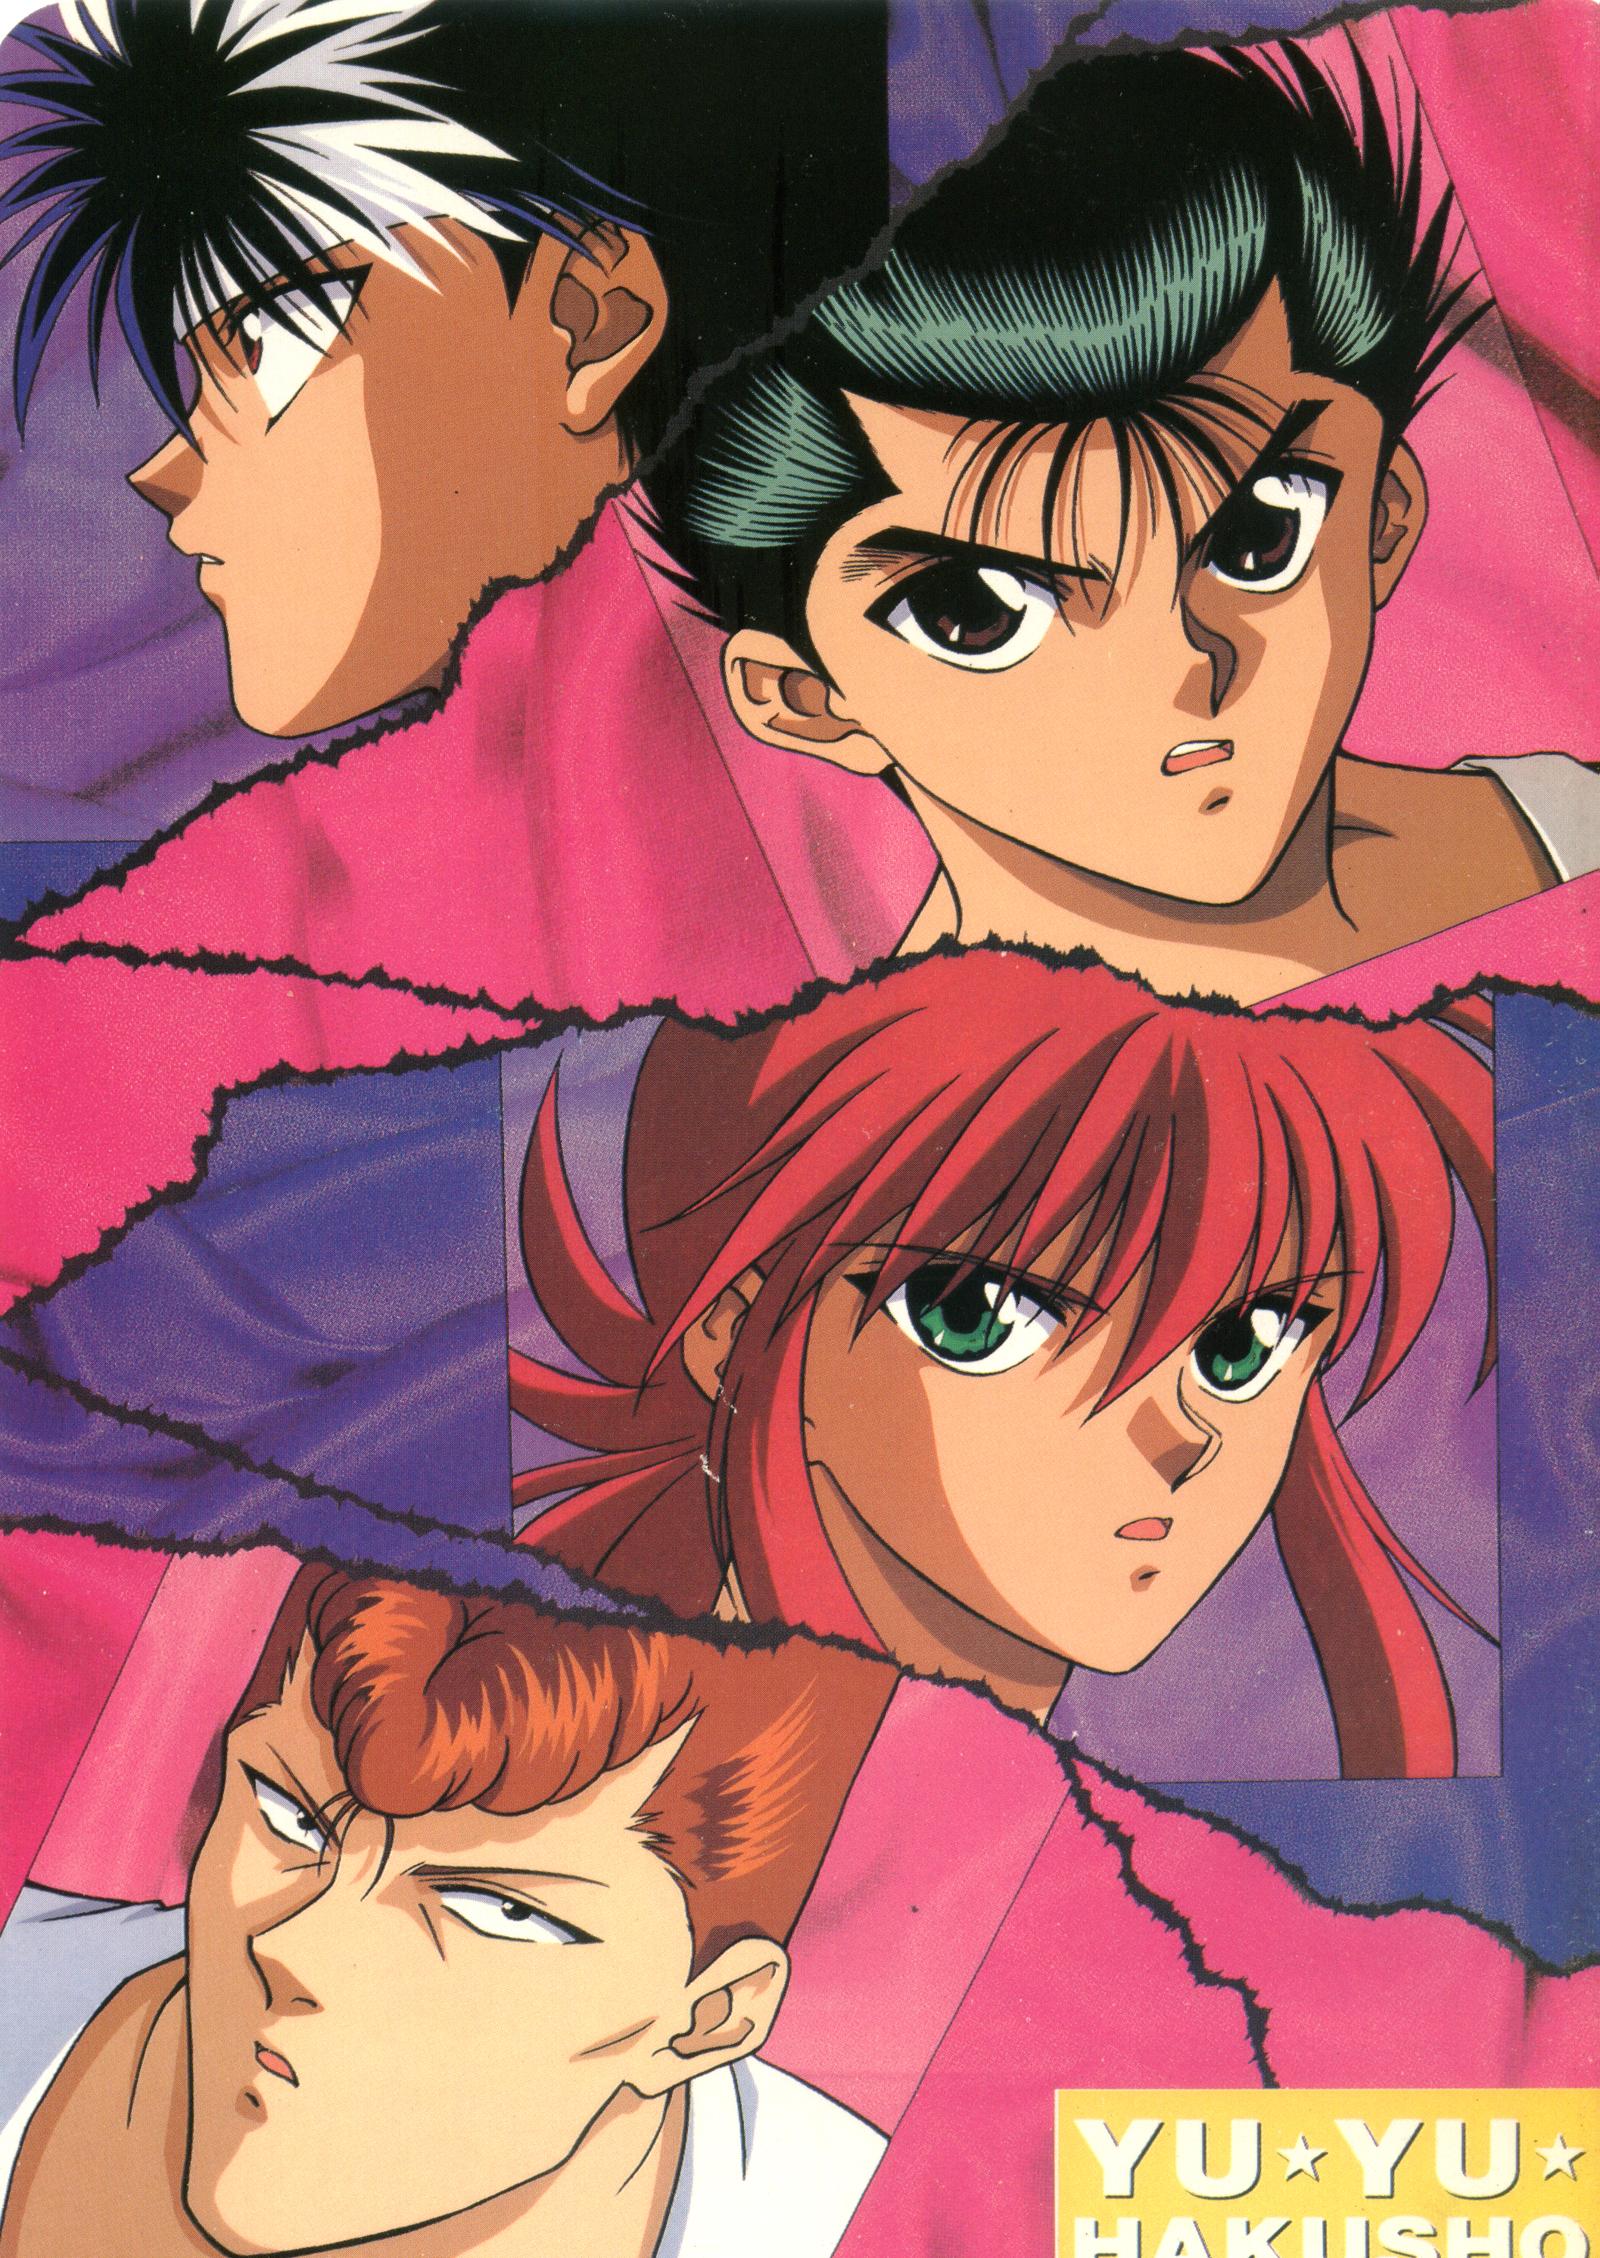 MANGA: Aibu Higashino Yuu Shoki Tanpeshuu Chapter 1 : Free